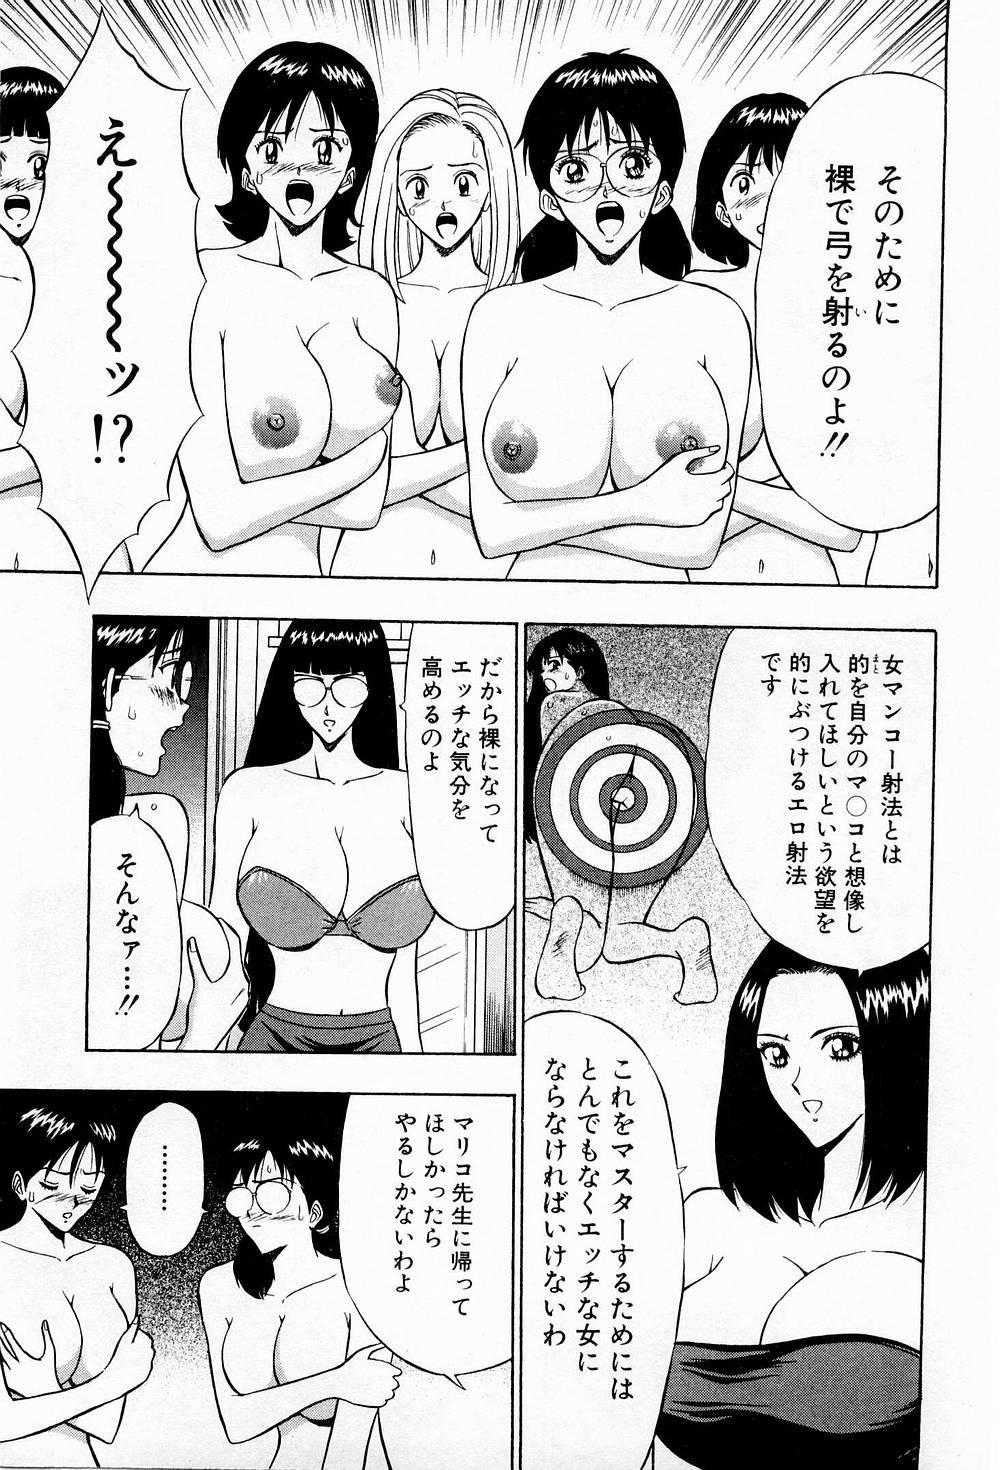 Bakusha Kyuudou Men 3 38